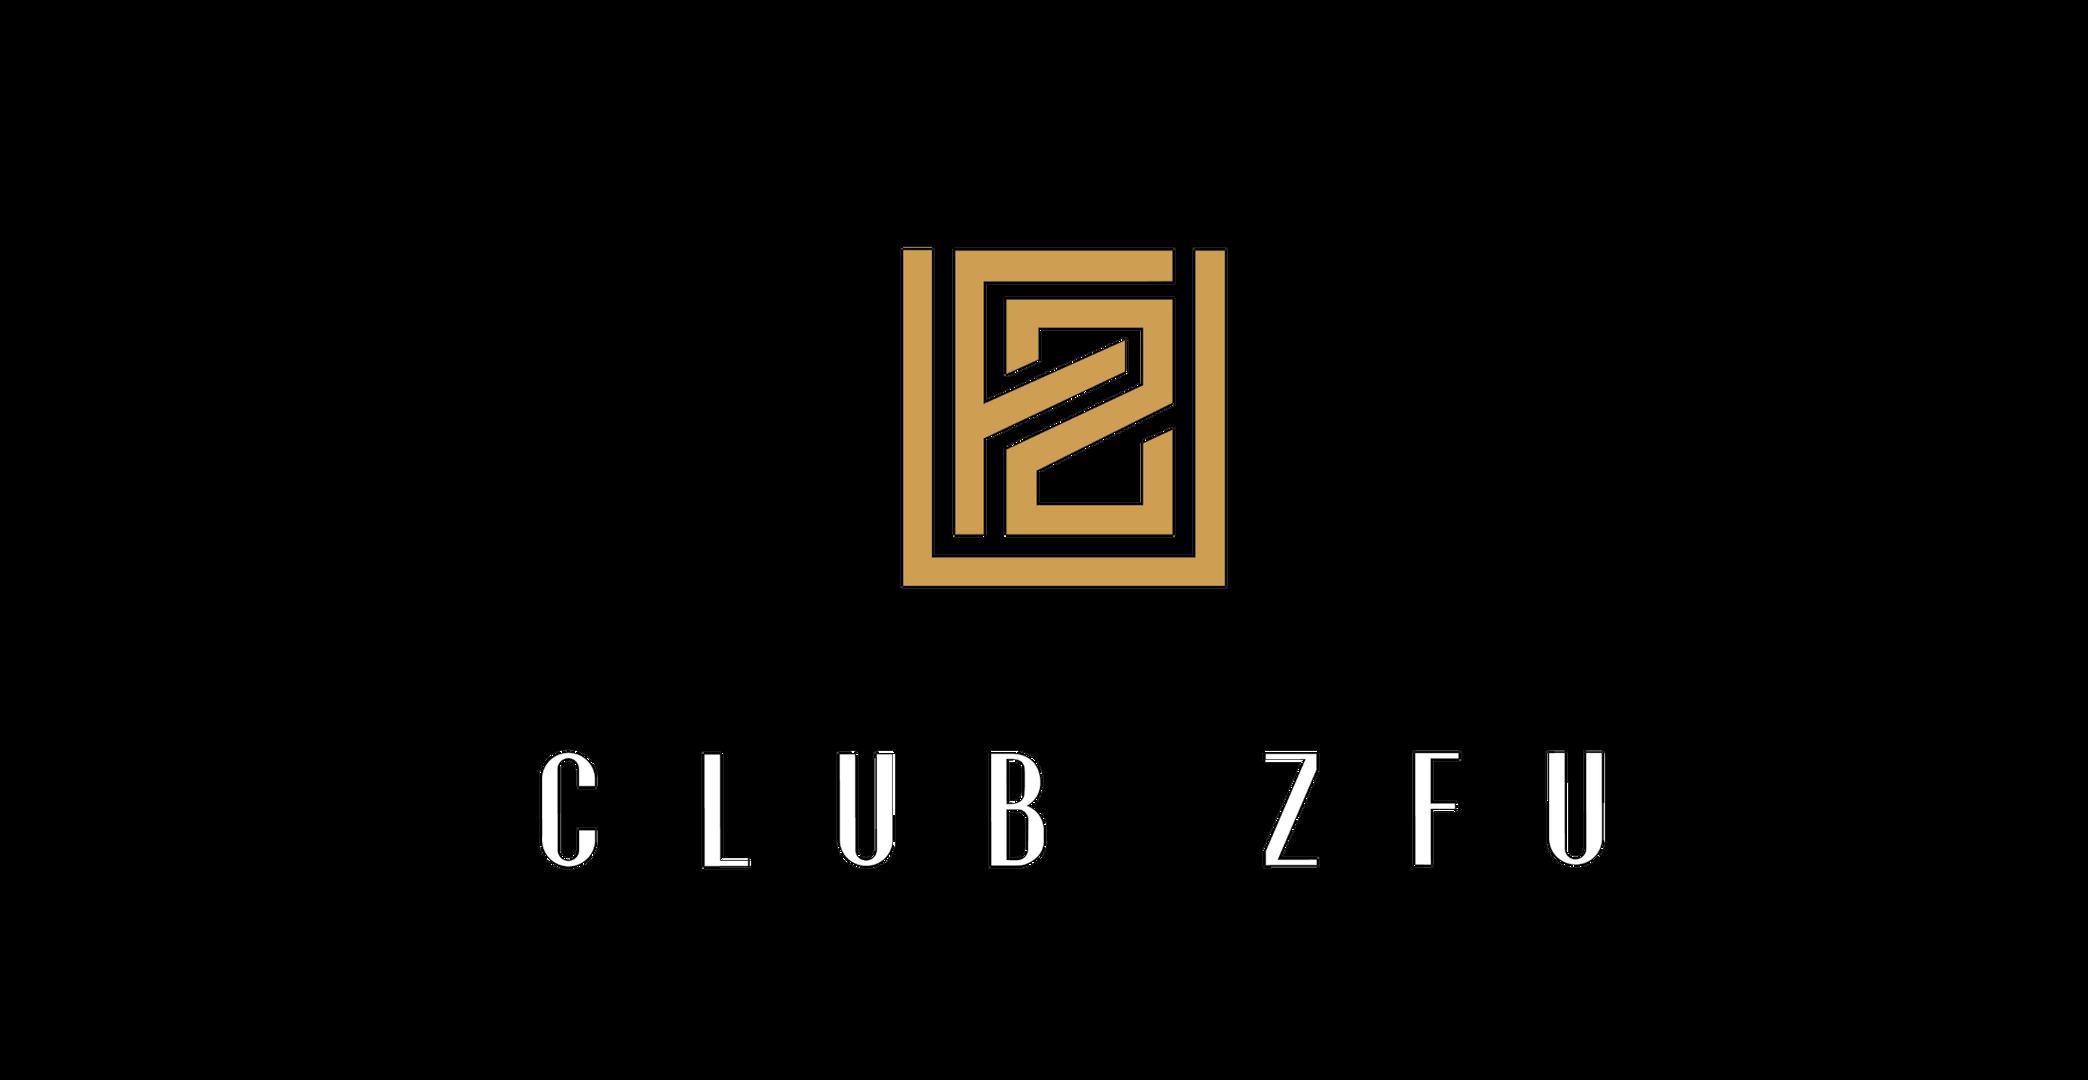 ZFU_edited.png